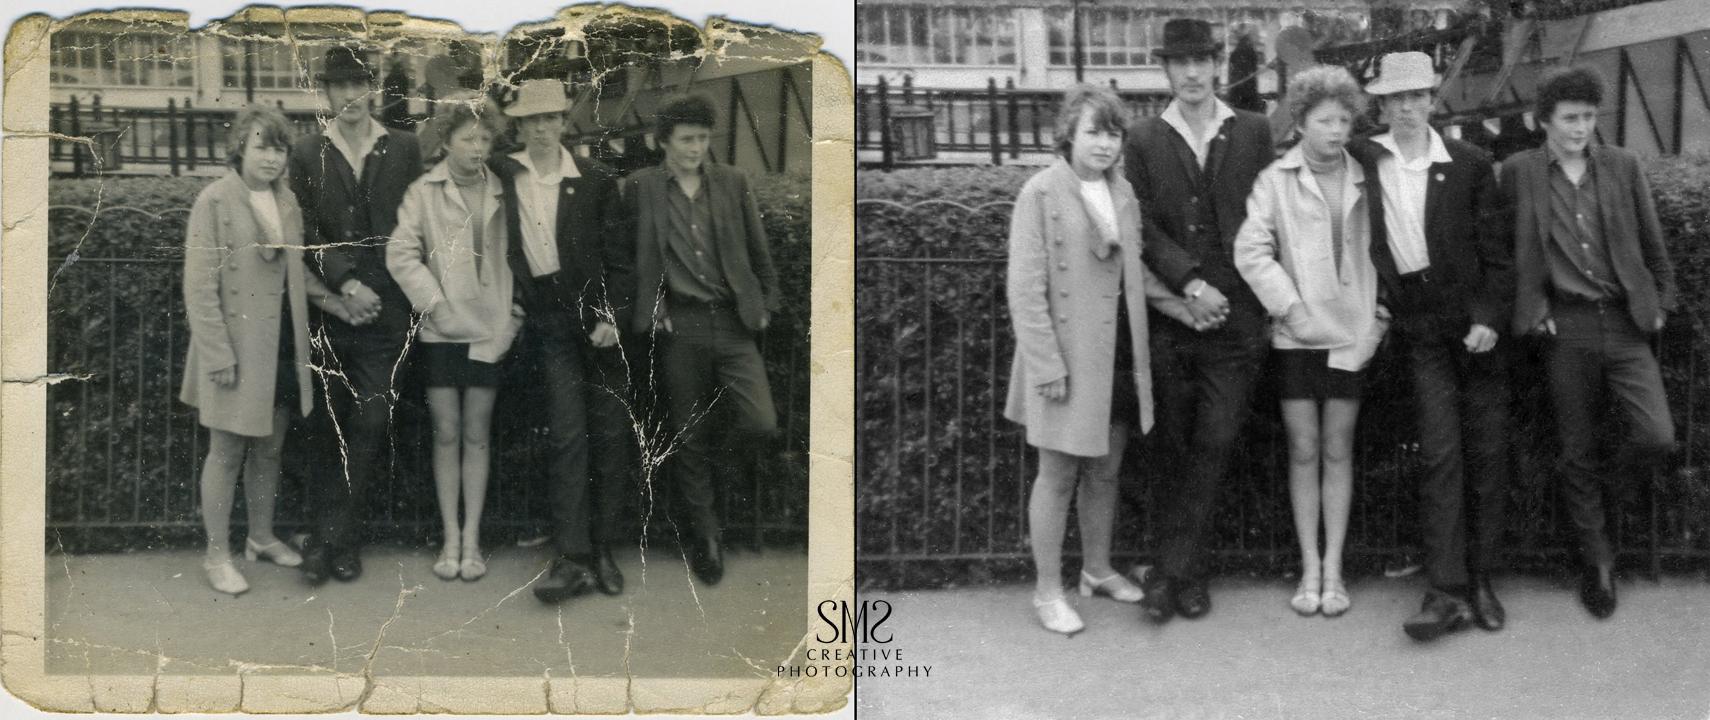 SMS Creative Photography- Restoration Photography